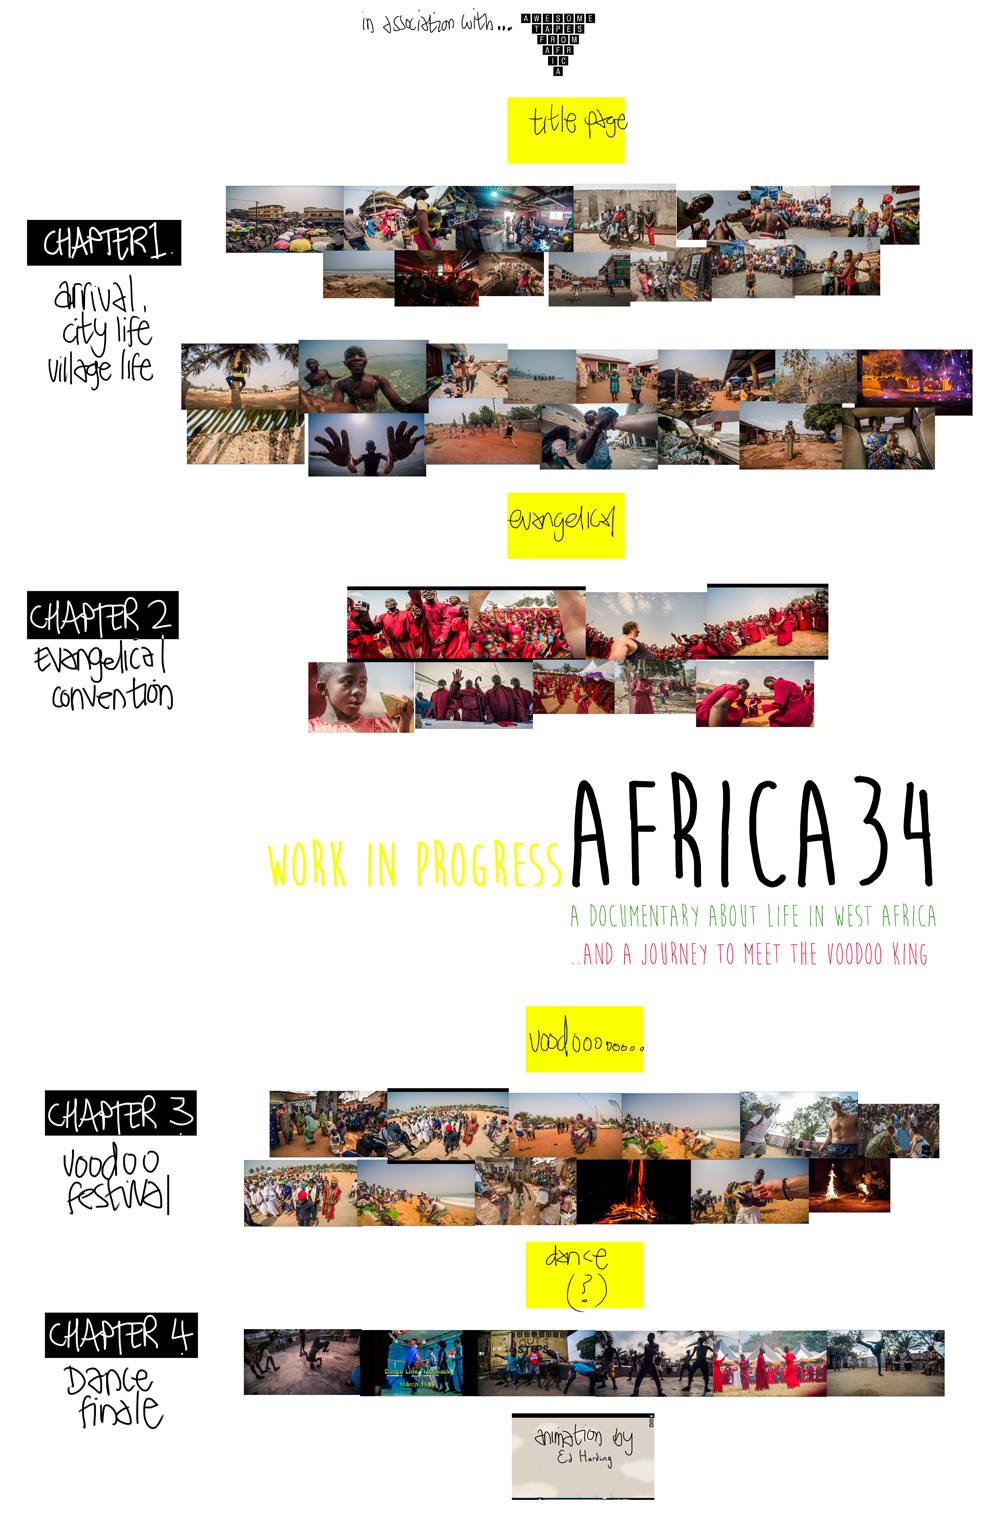 AFRIKA34_2016lowjpg.jpg